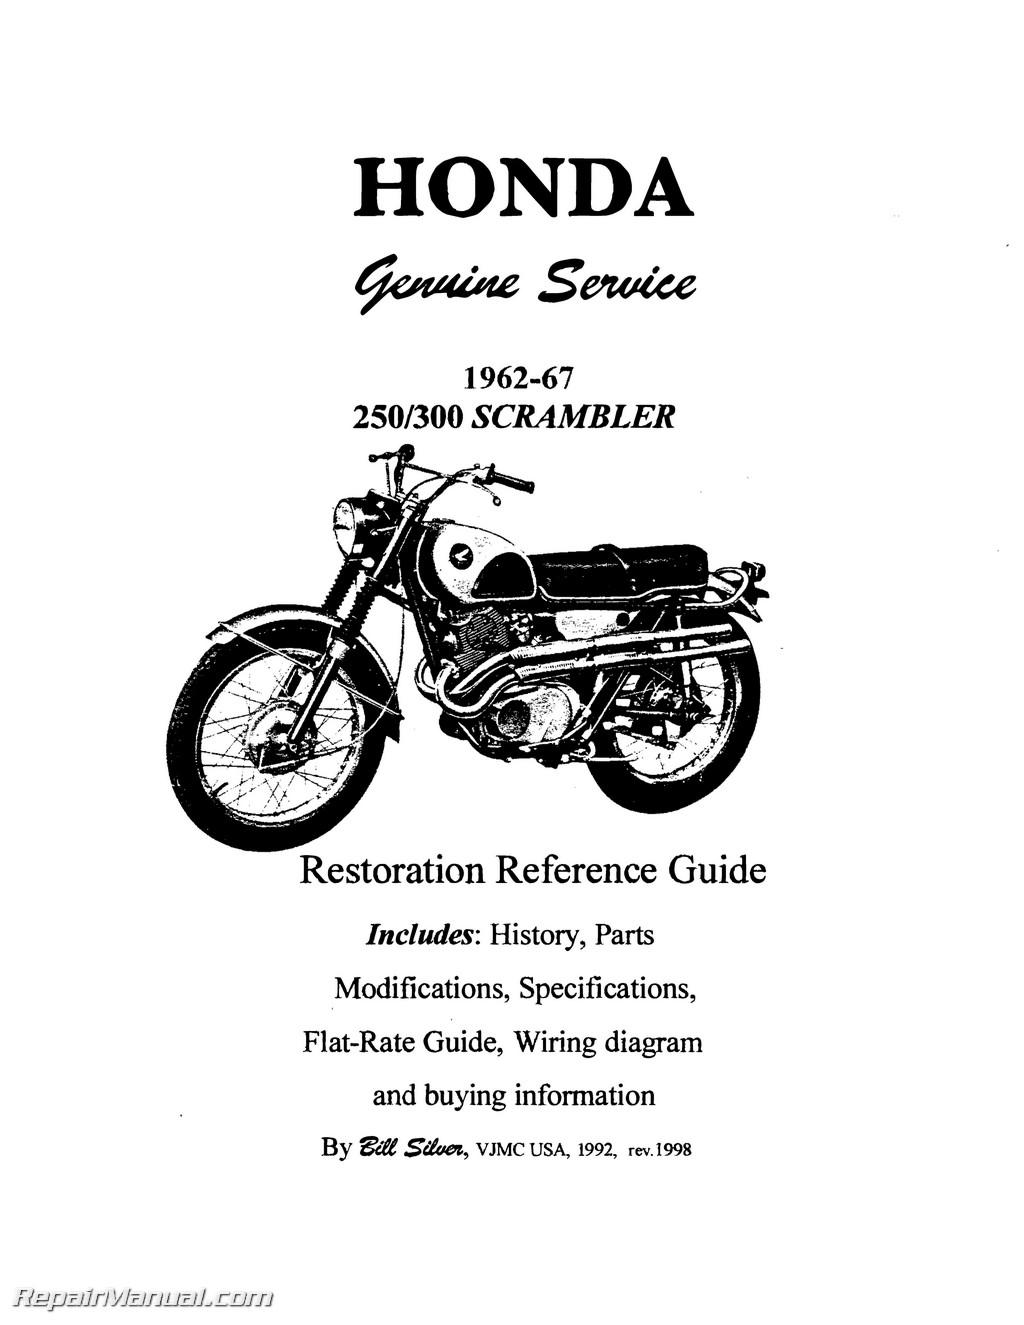 Honda SuperHawk & Scrambler Motorcycle Restoration